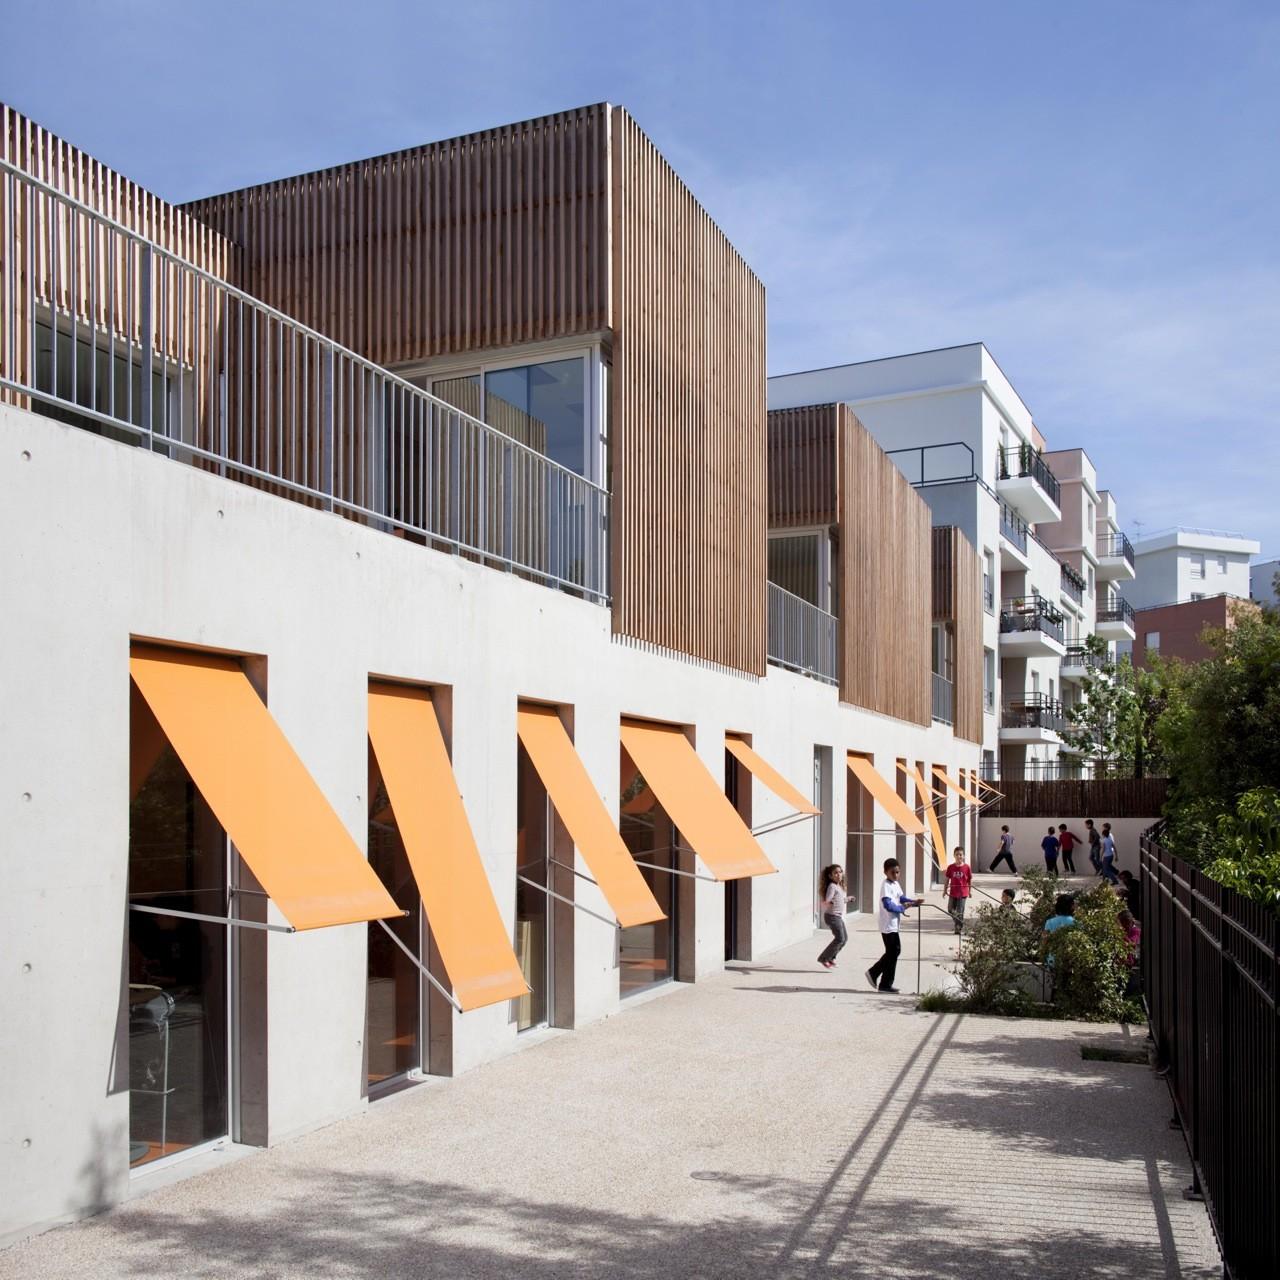 Gavroche Centre for Children / SOA Architectes, © Clément Guillaume